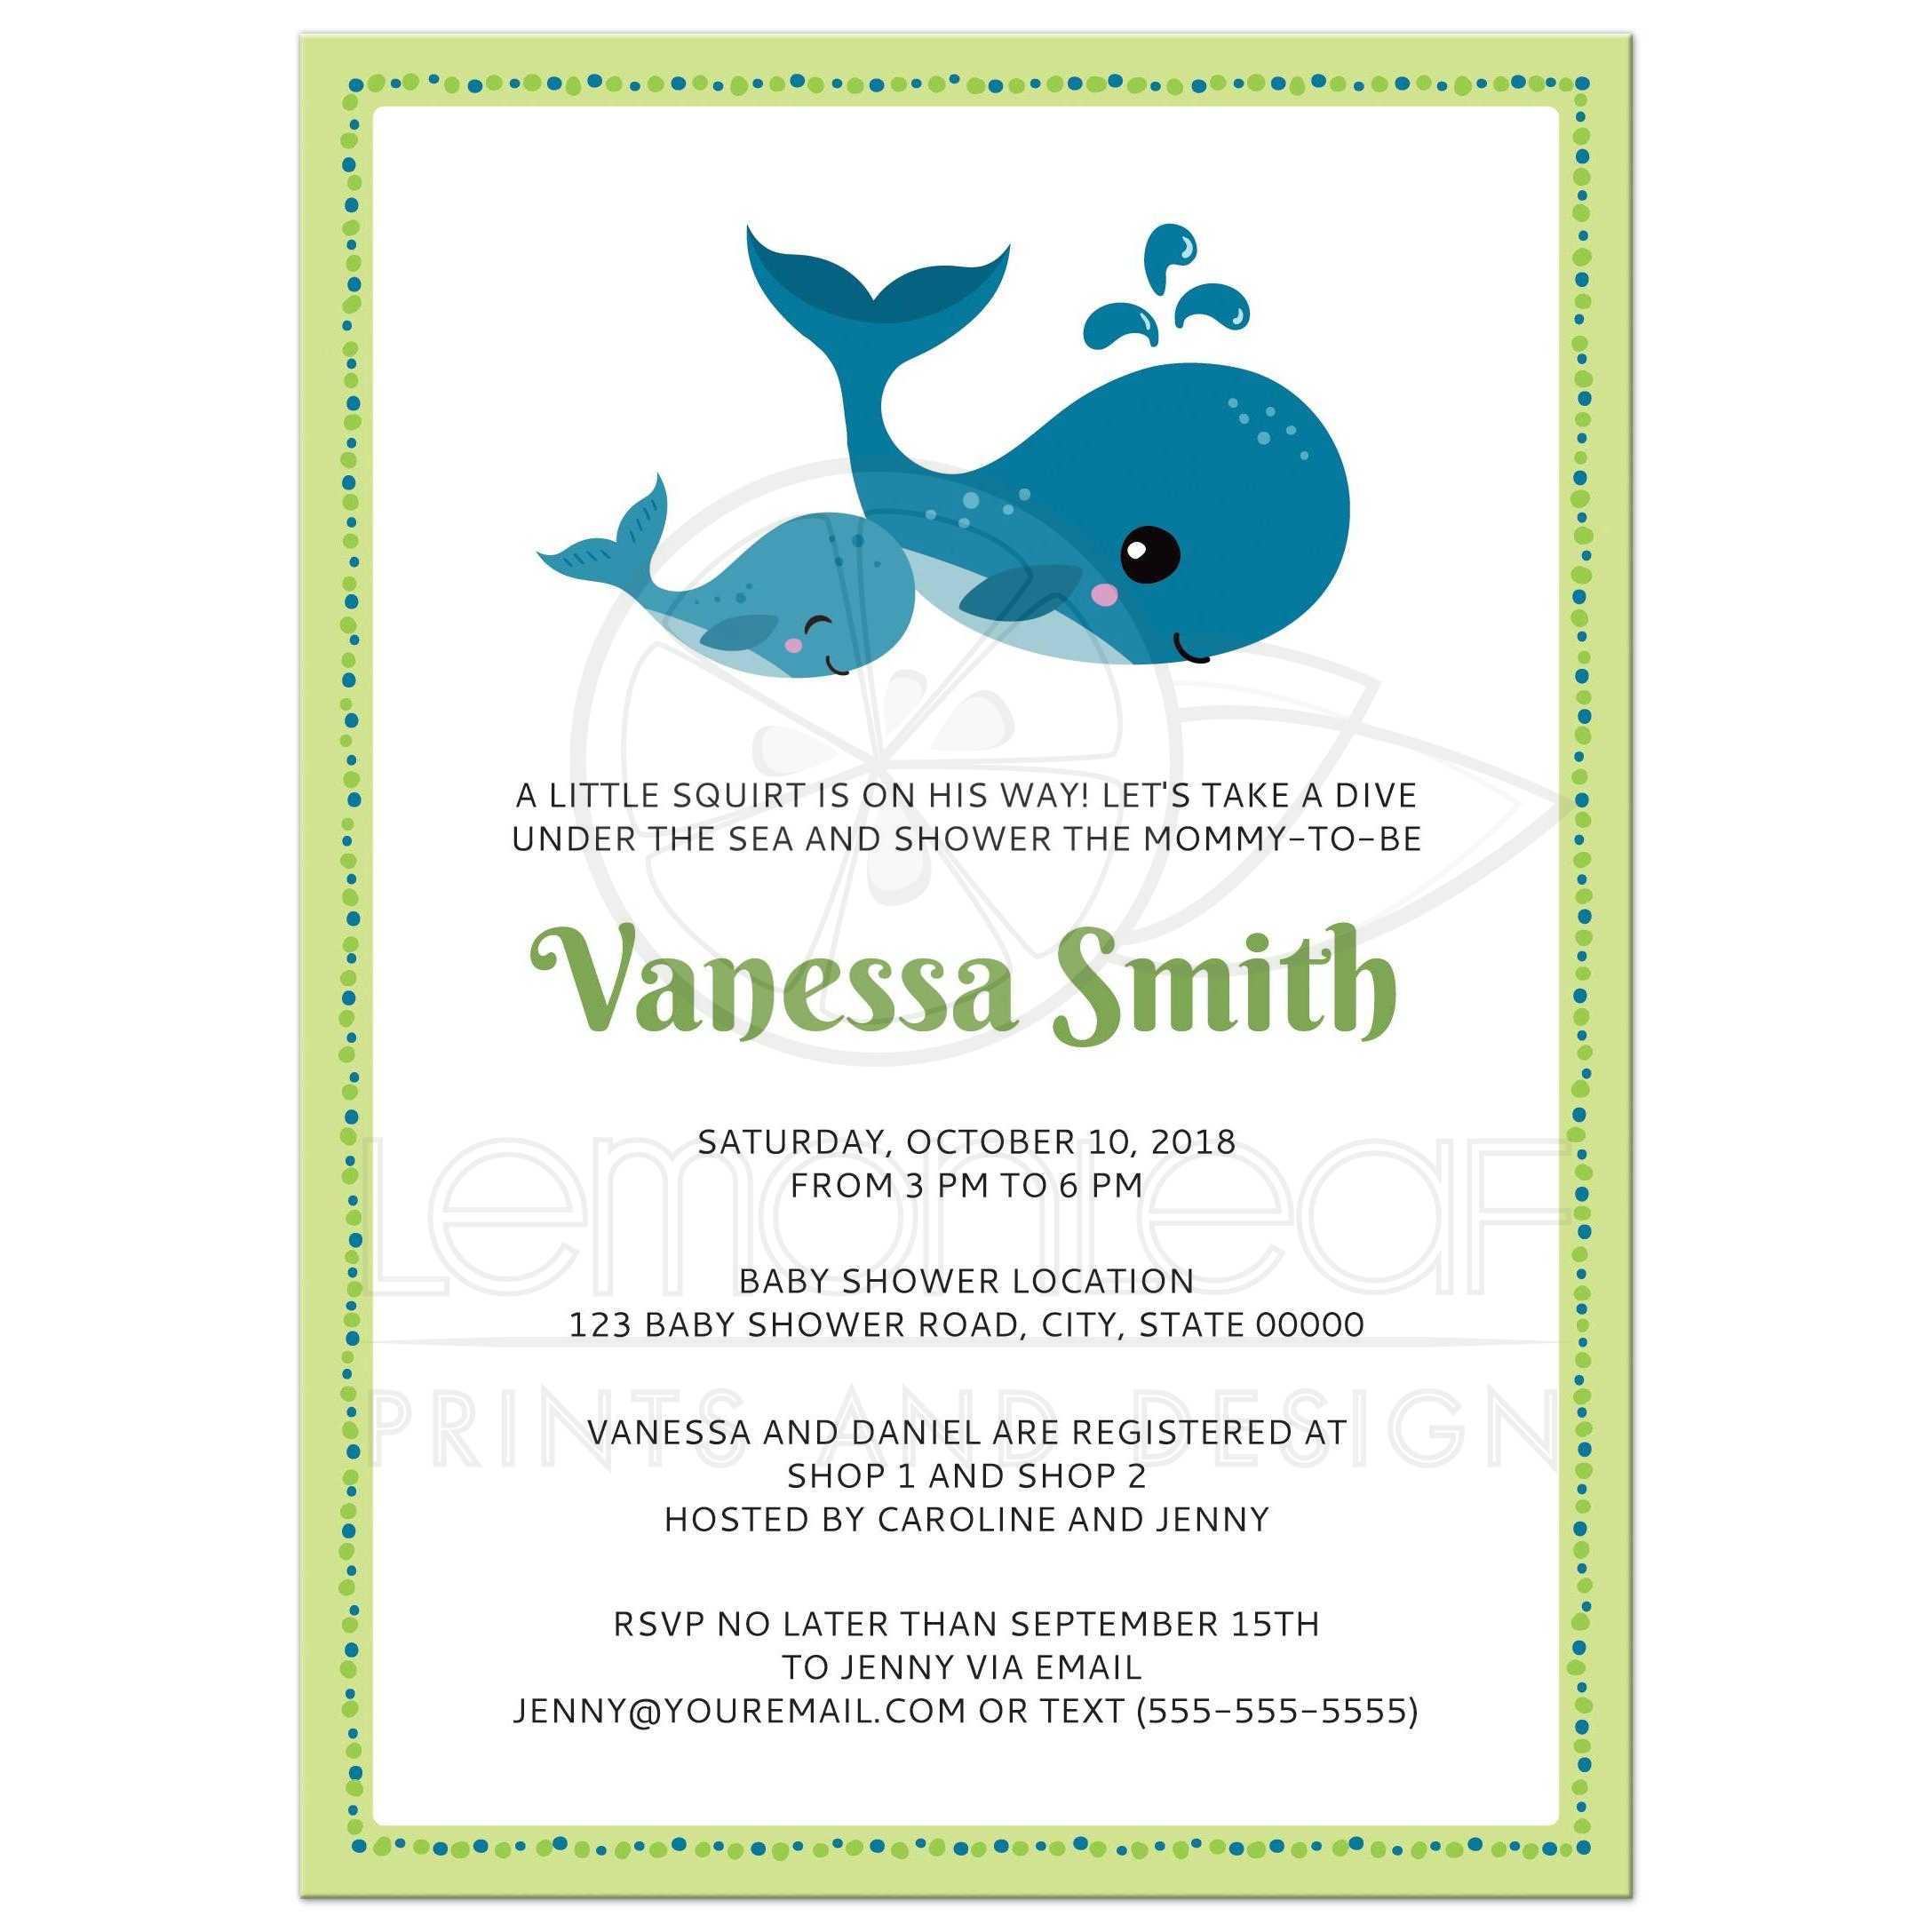 Image of baby shower invitations via email free baby shower baby bird blue shower invite bird baby shower theme boy birds filmwisefo